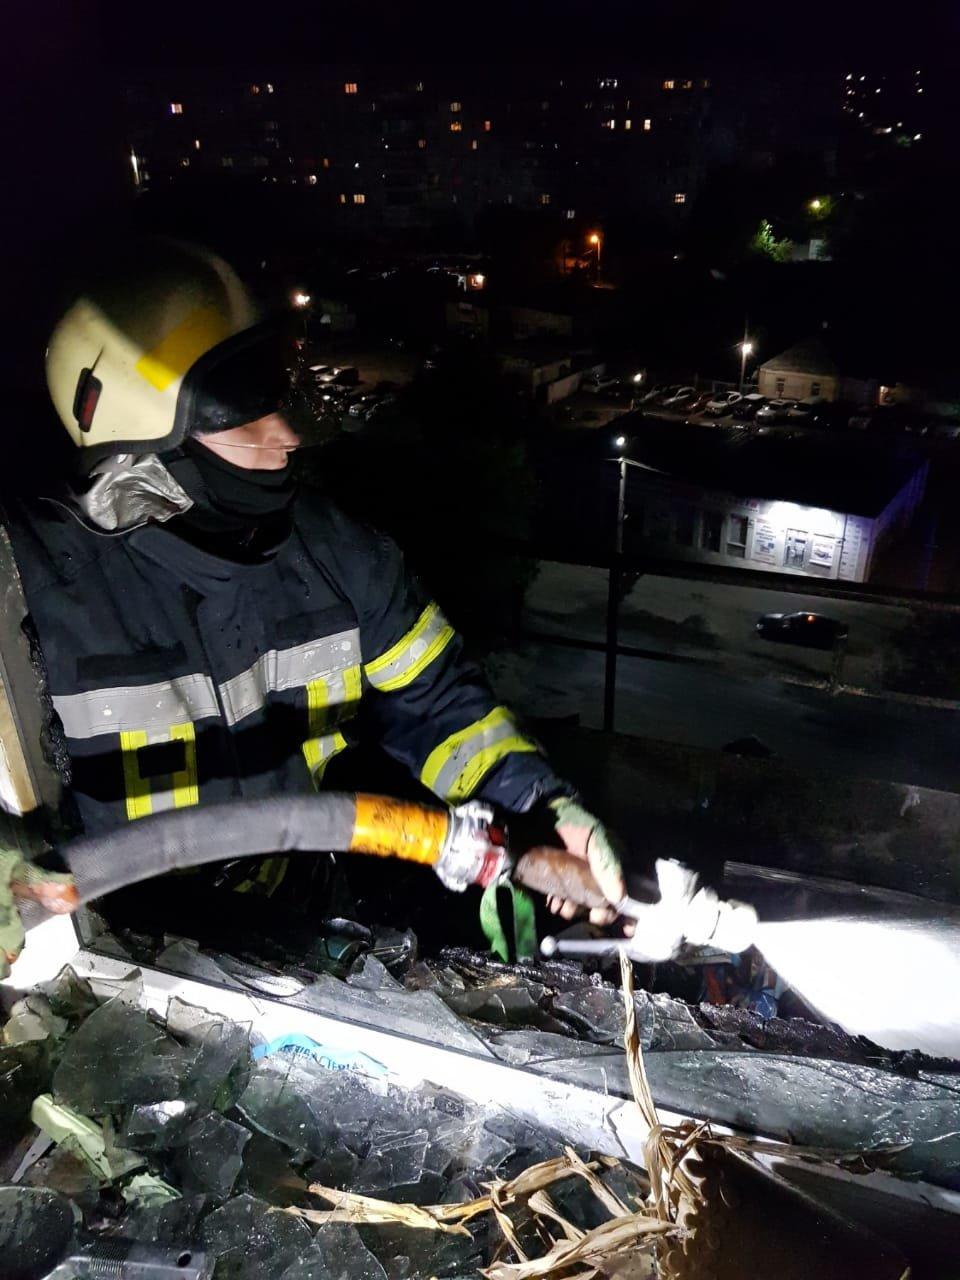 На Днепропетровщине горел балкон девятого этажа многоэтажки, - ФОТО, фото-2